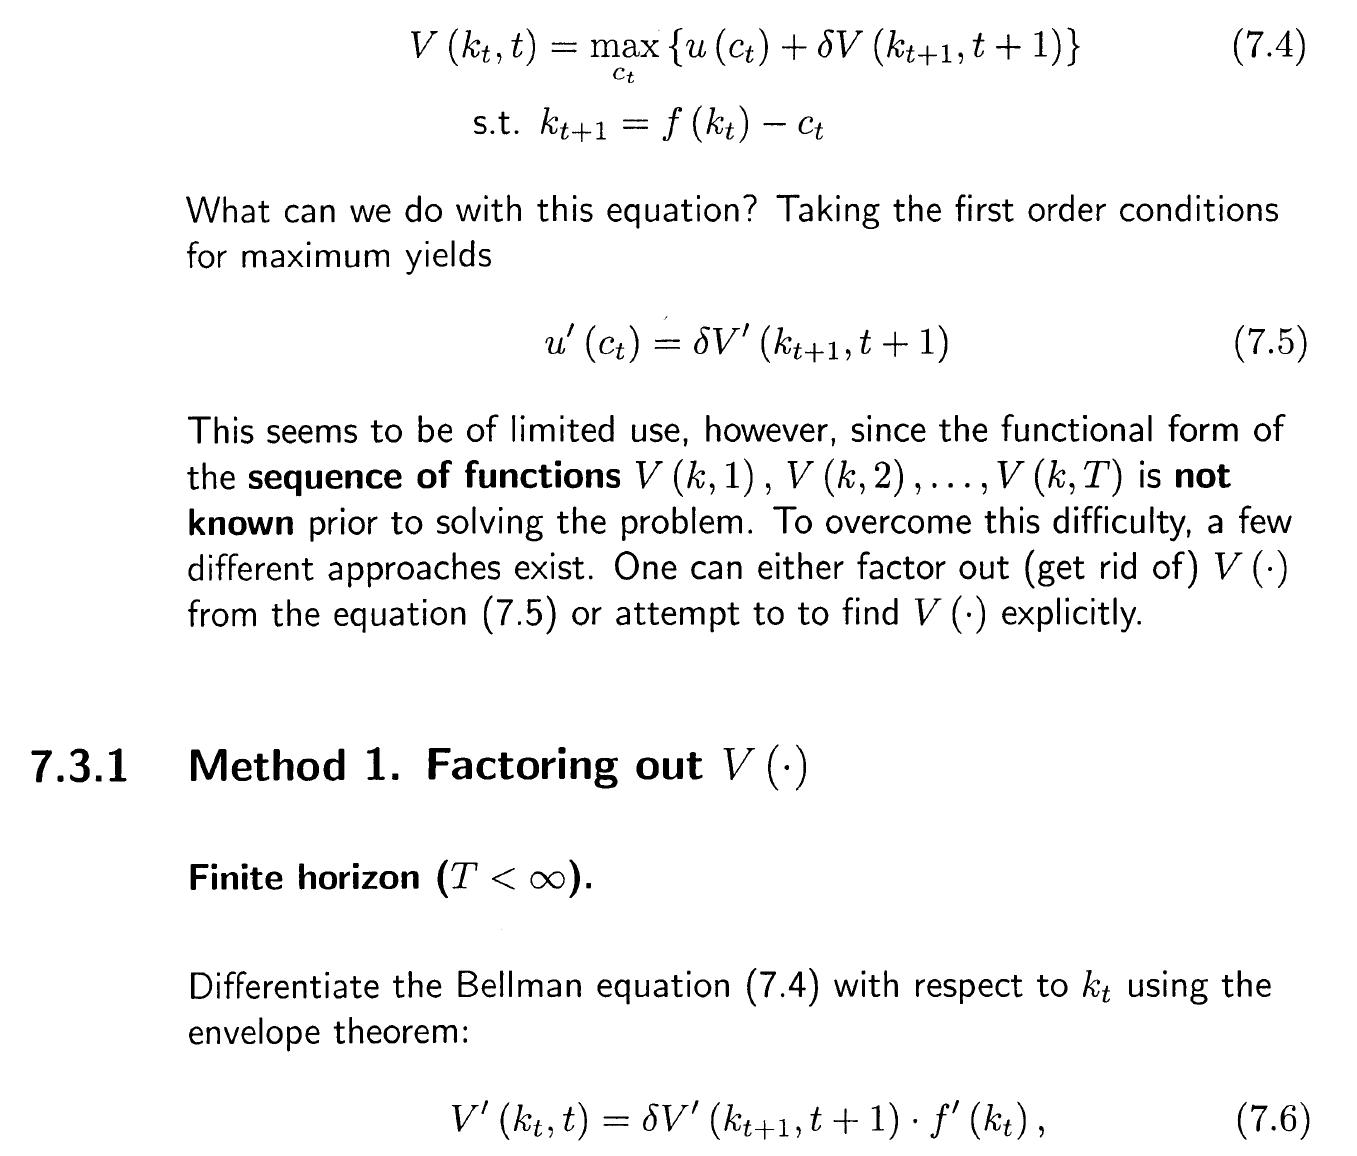 Differentiating Bellman equation using envelope  theorem.png